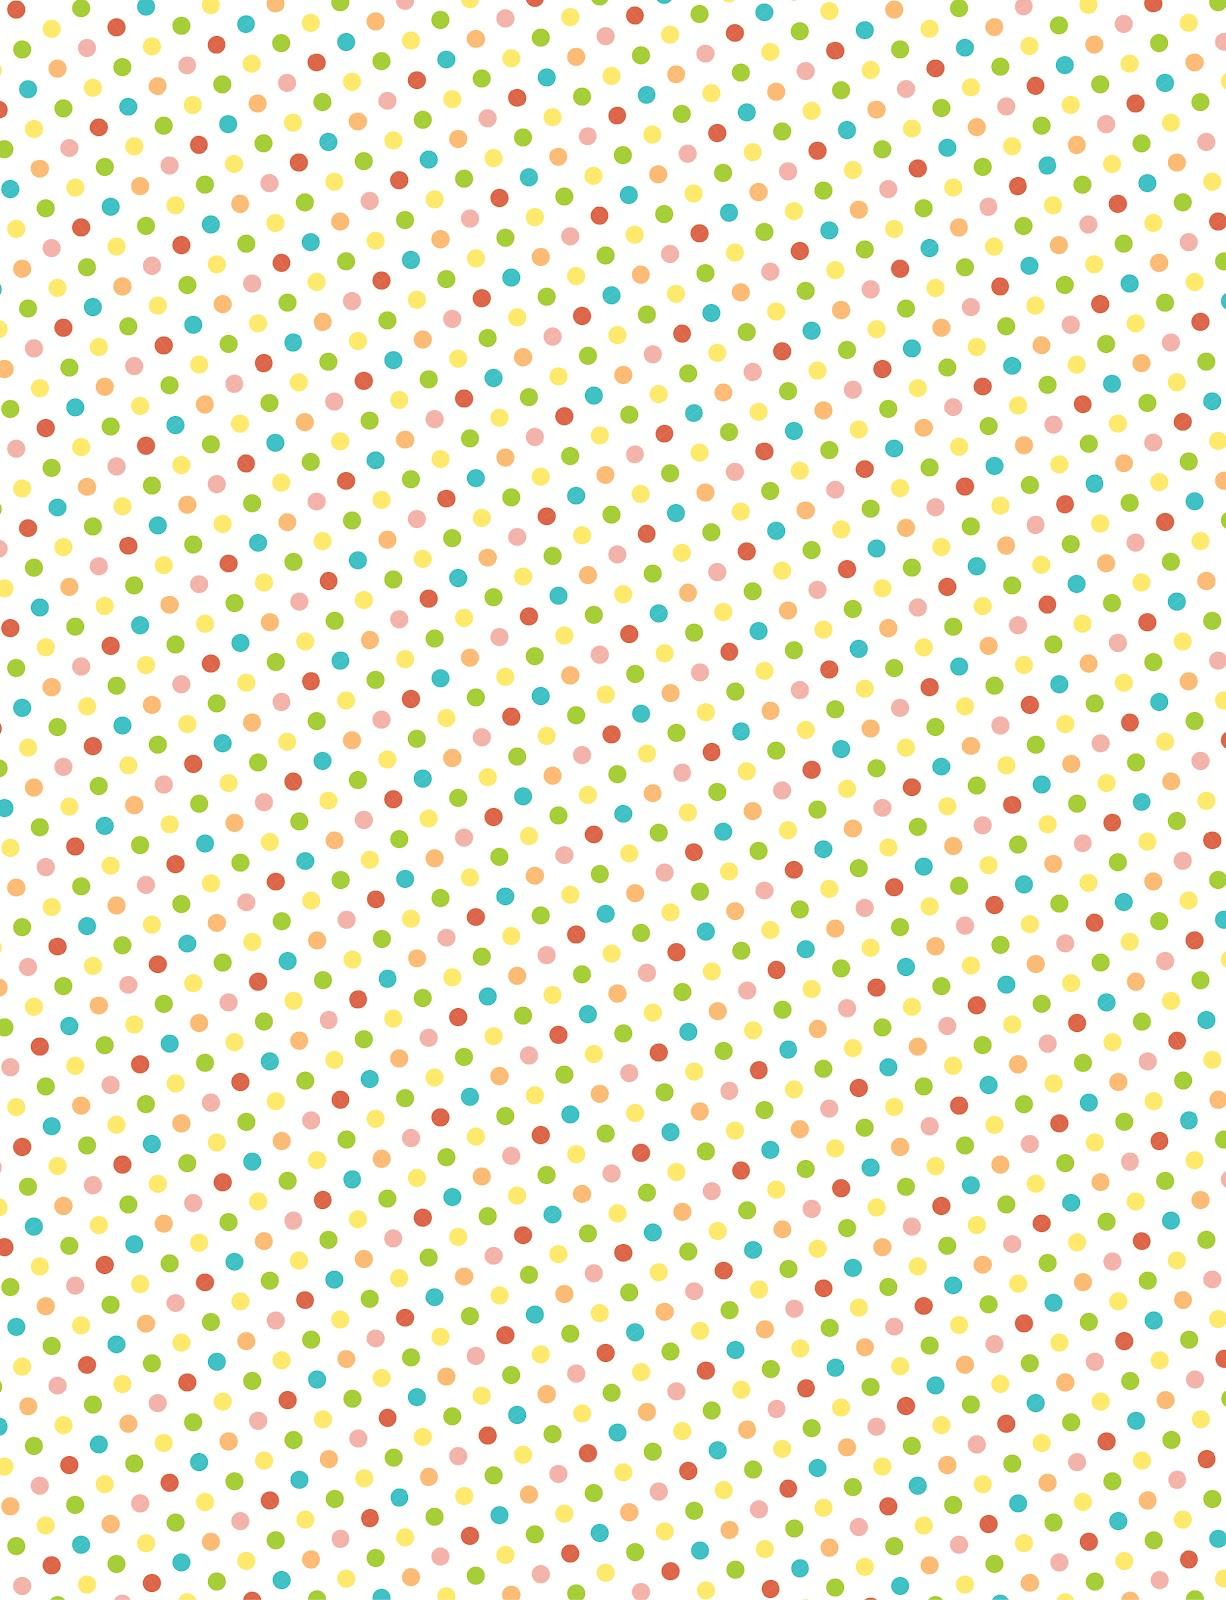 Amy J Delightful Blog Printable Polka Dot Patterns For Making Washi Tape Stickers